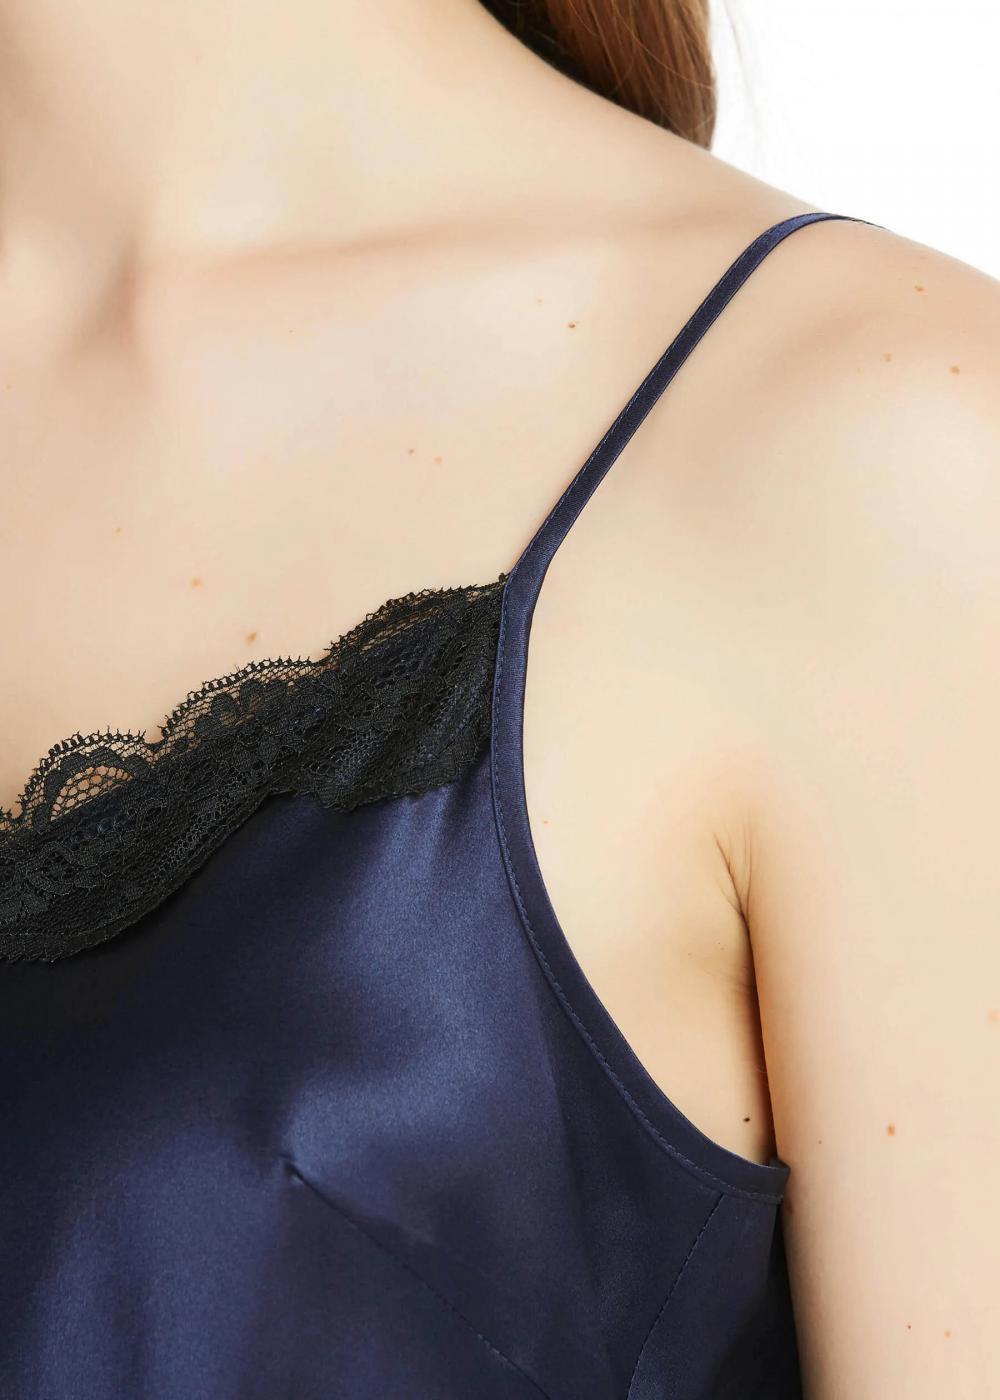 22 Momme Camison Seda Sexy Con Encaje Azul Marino Xs 06 Webp Jpg